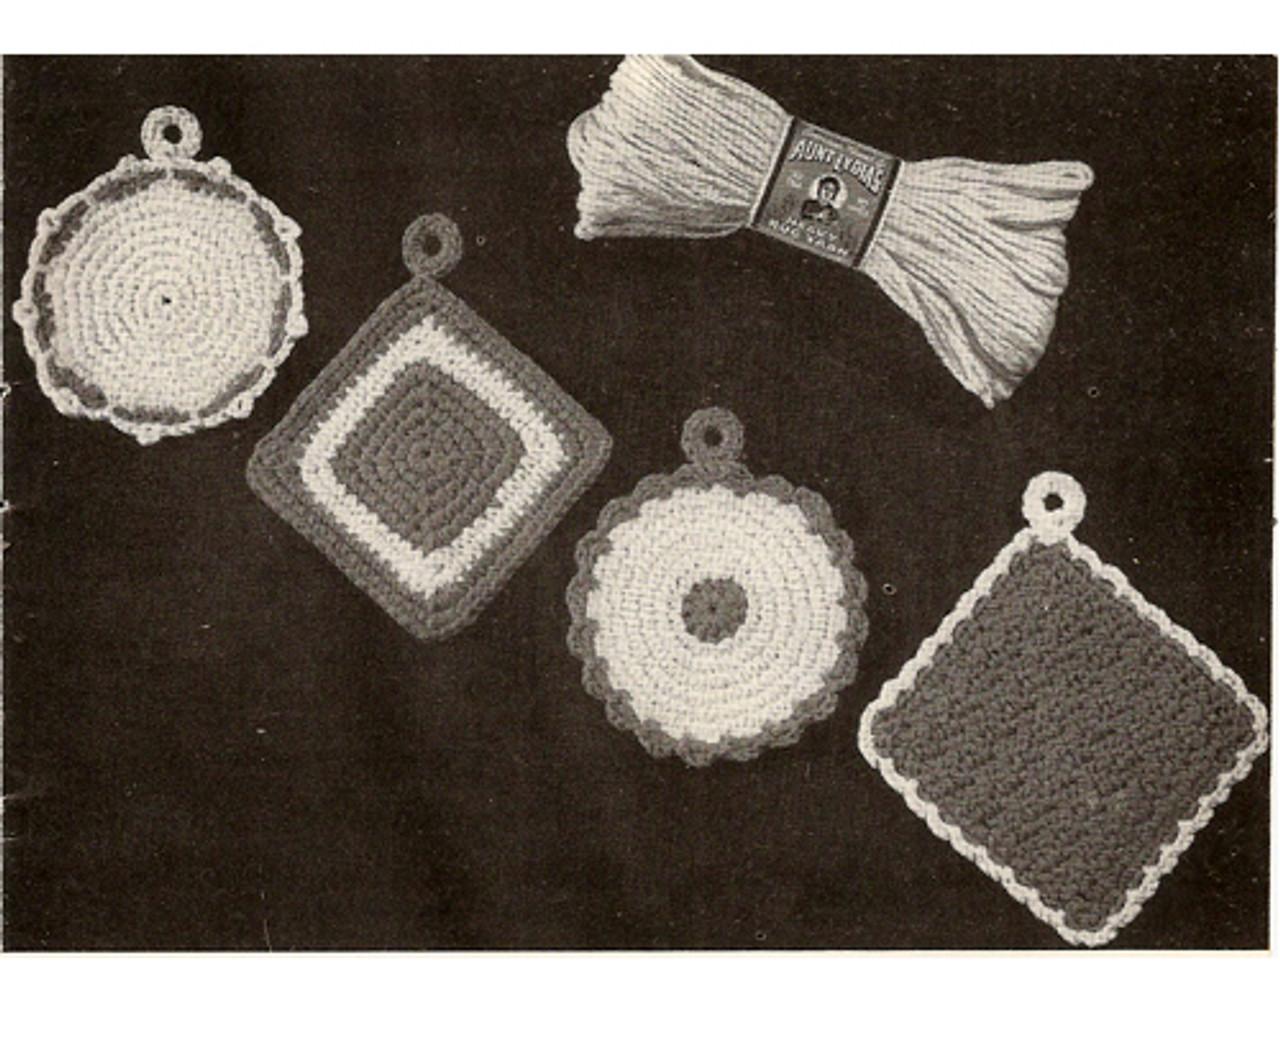 Vintage Crochet Potholders Pattern